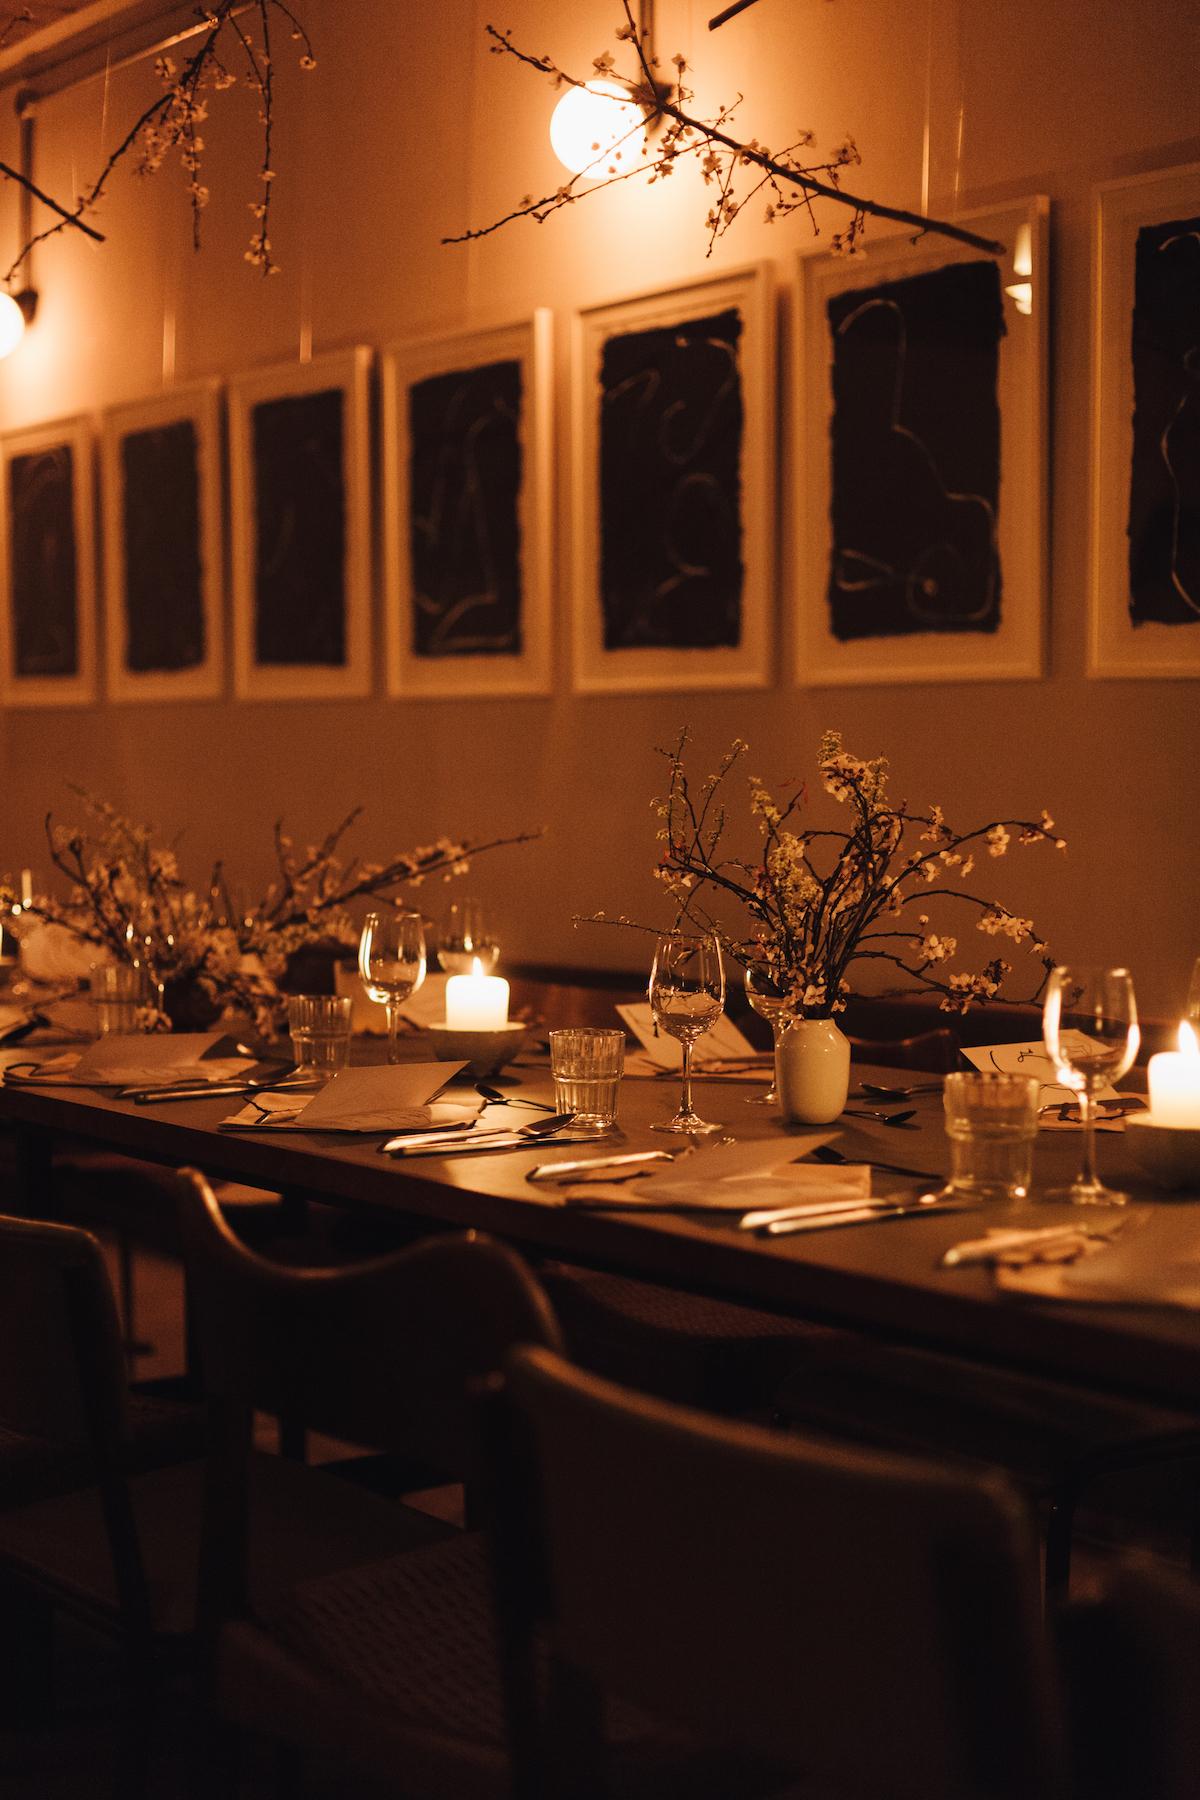 26-GRAINS-Alexa-Coe-supperlub-23.jpg